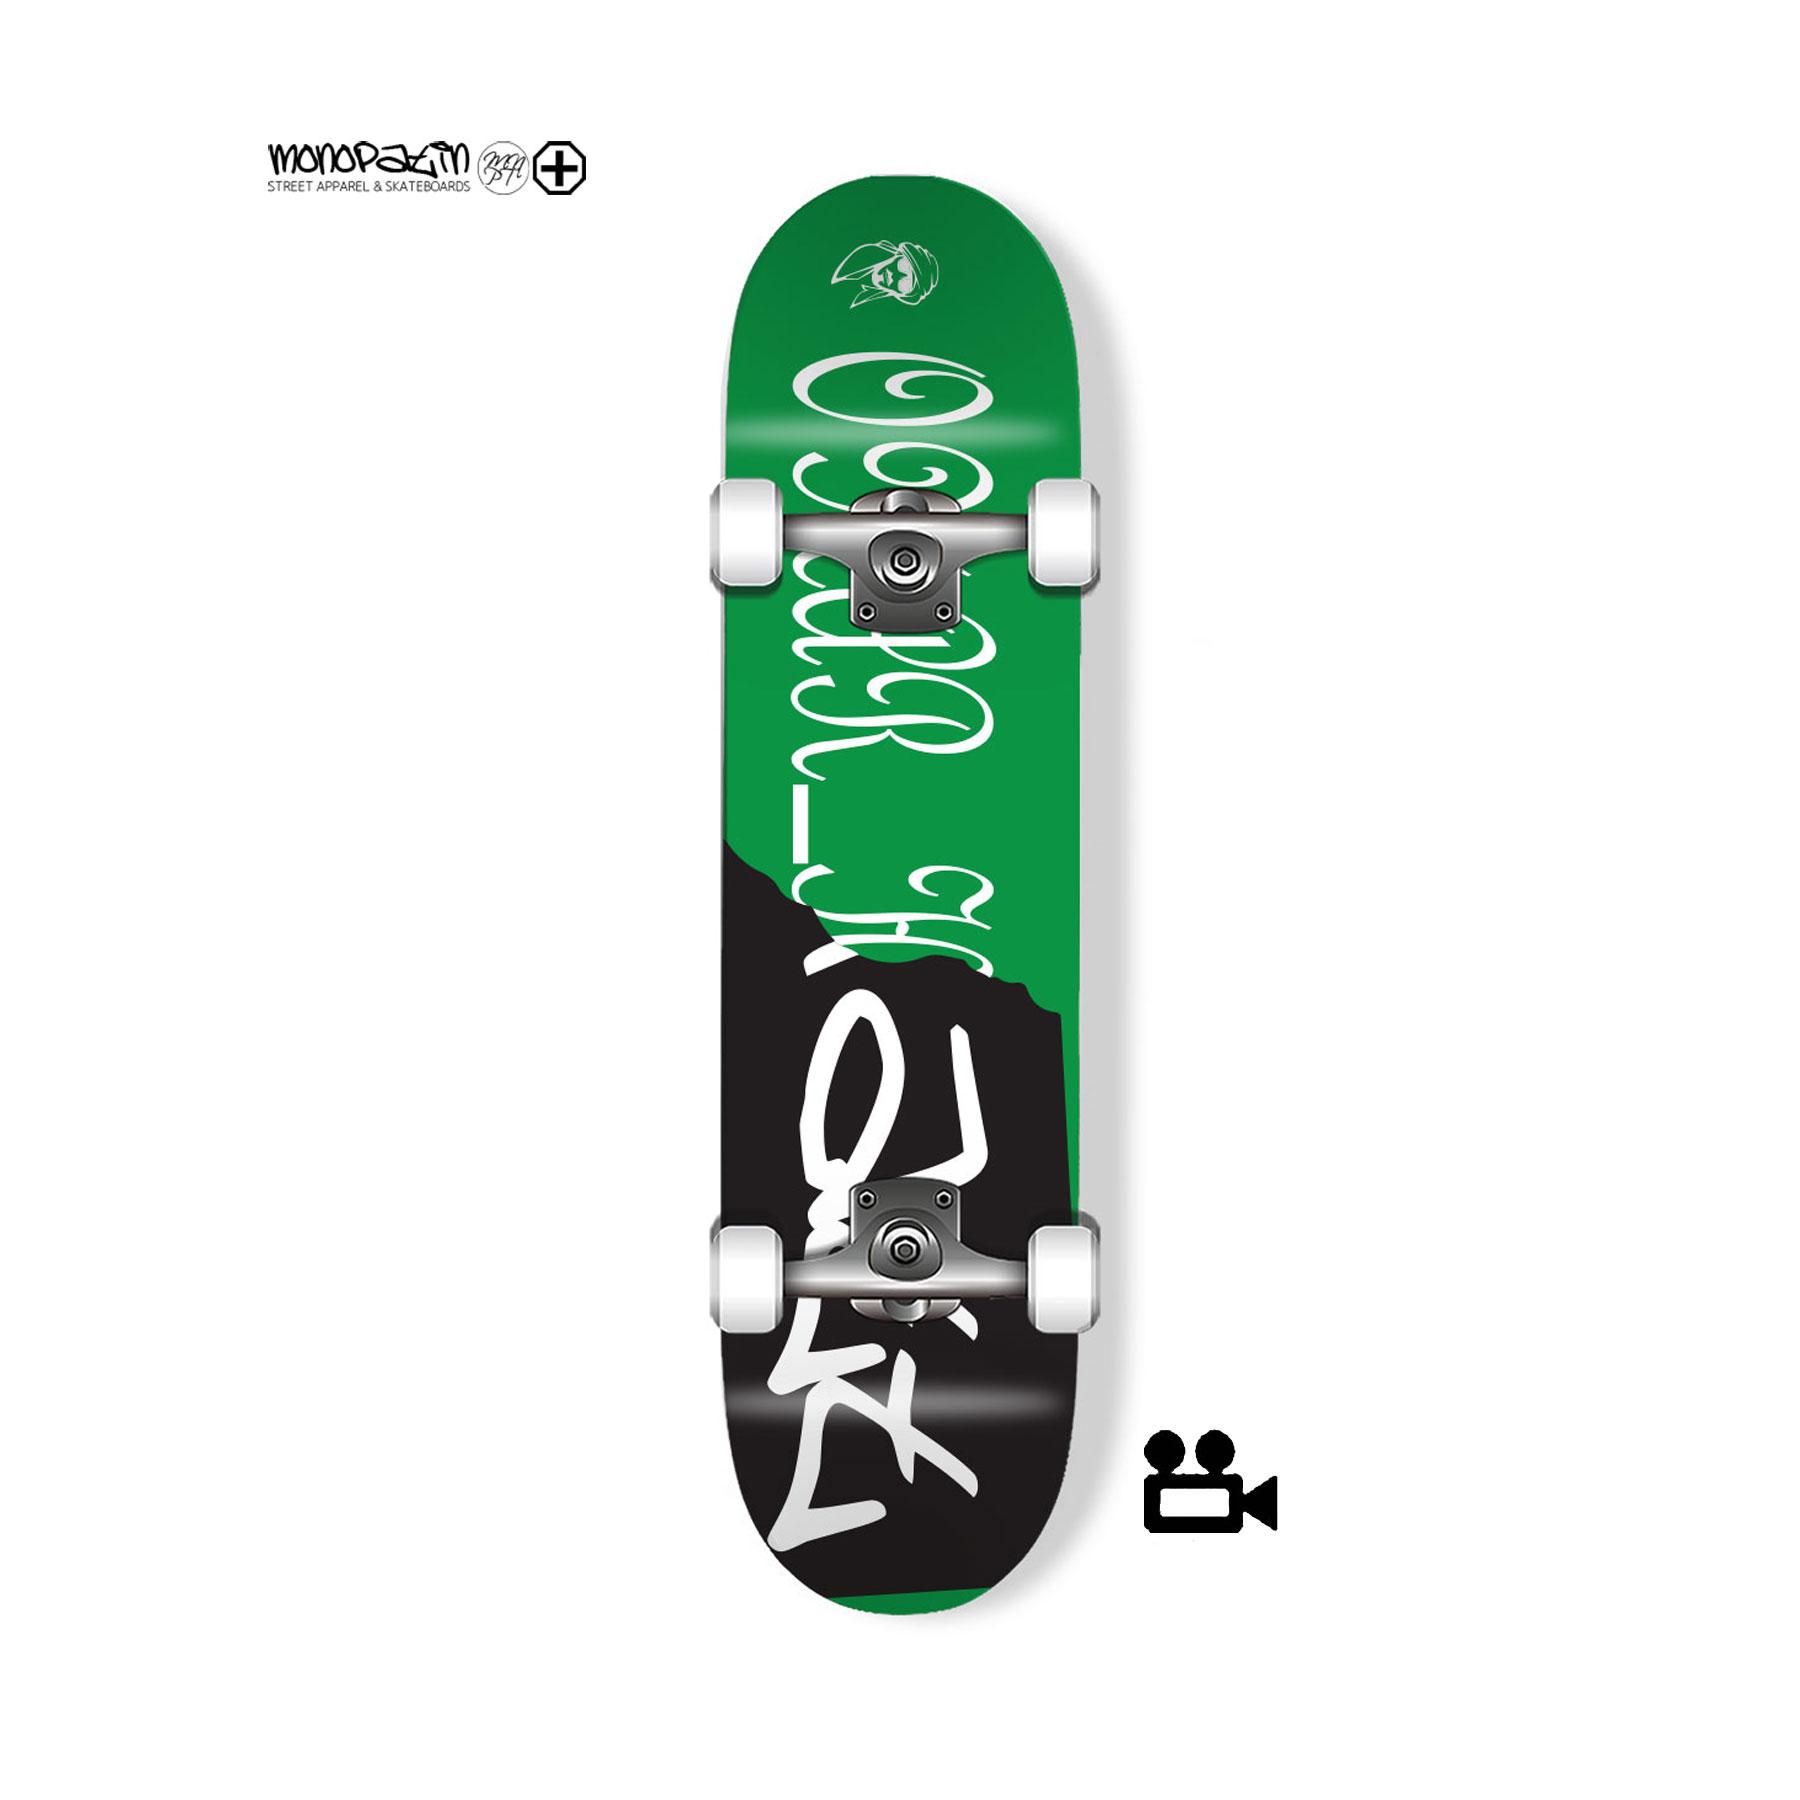 """omar_hatt"" signature 컴플릿 스케이트보드"